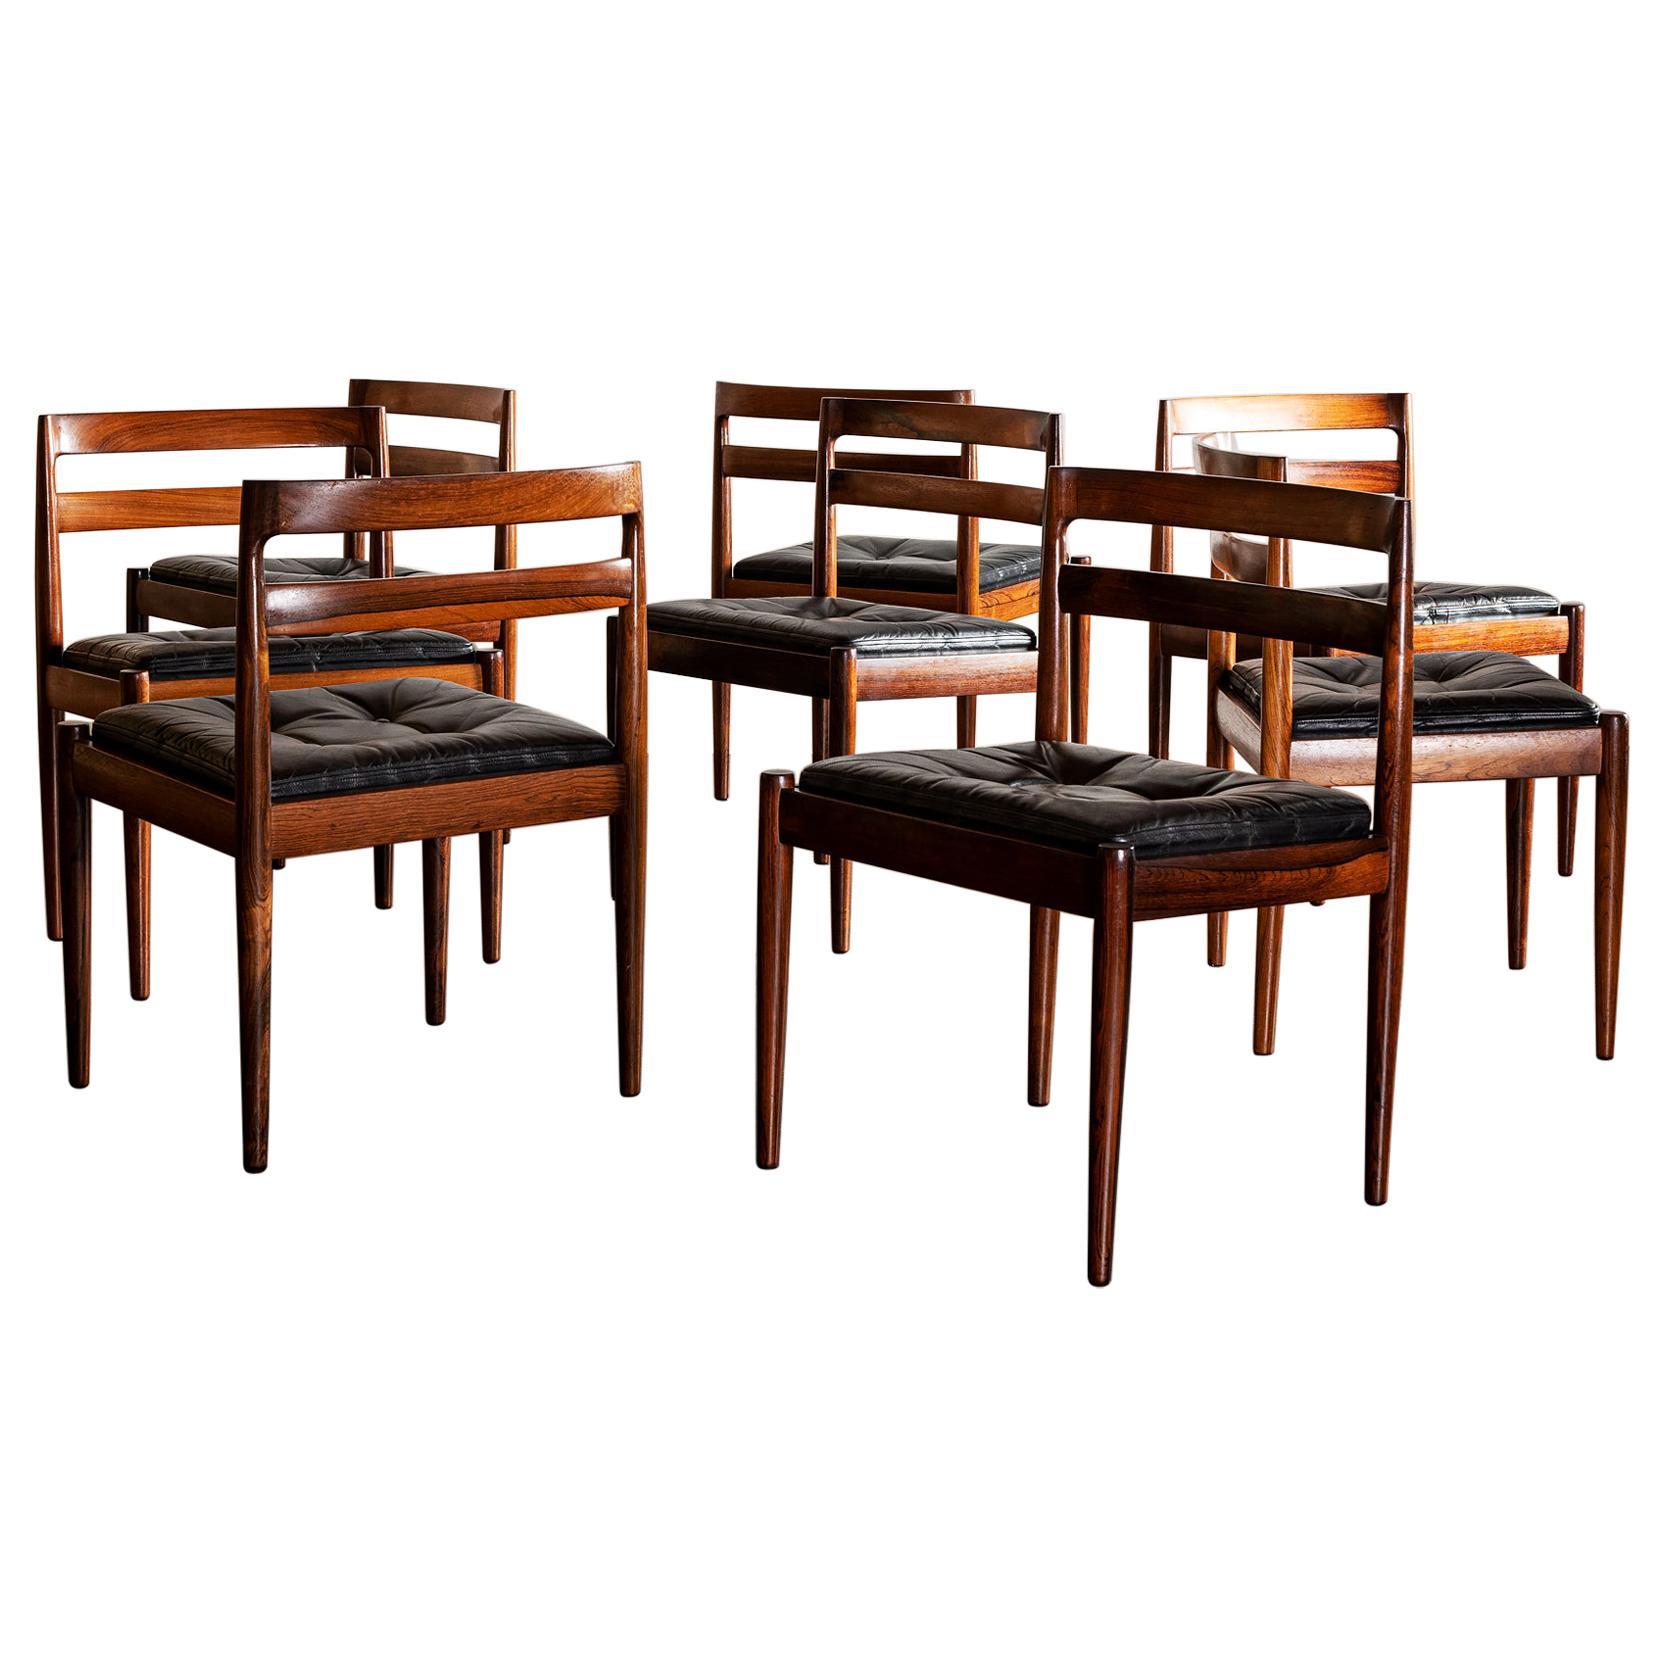 Set of Eight Kai Kristiansen Model 301 Dining Chairs in Rosewood, Denmark, 1960